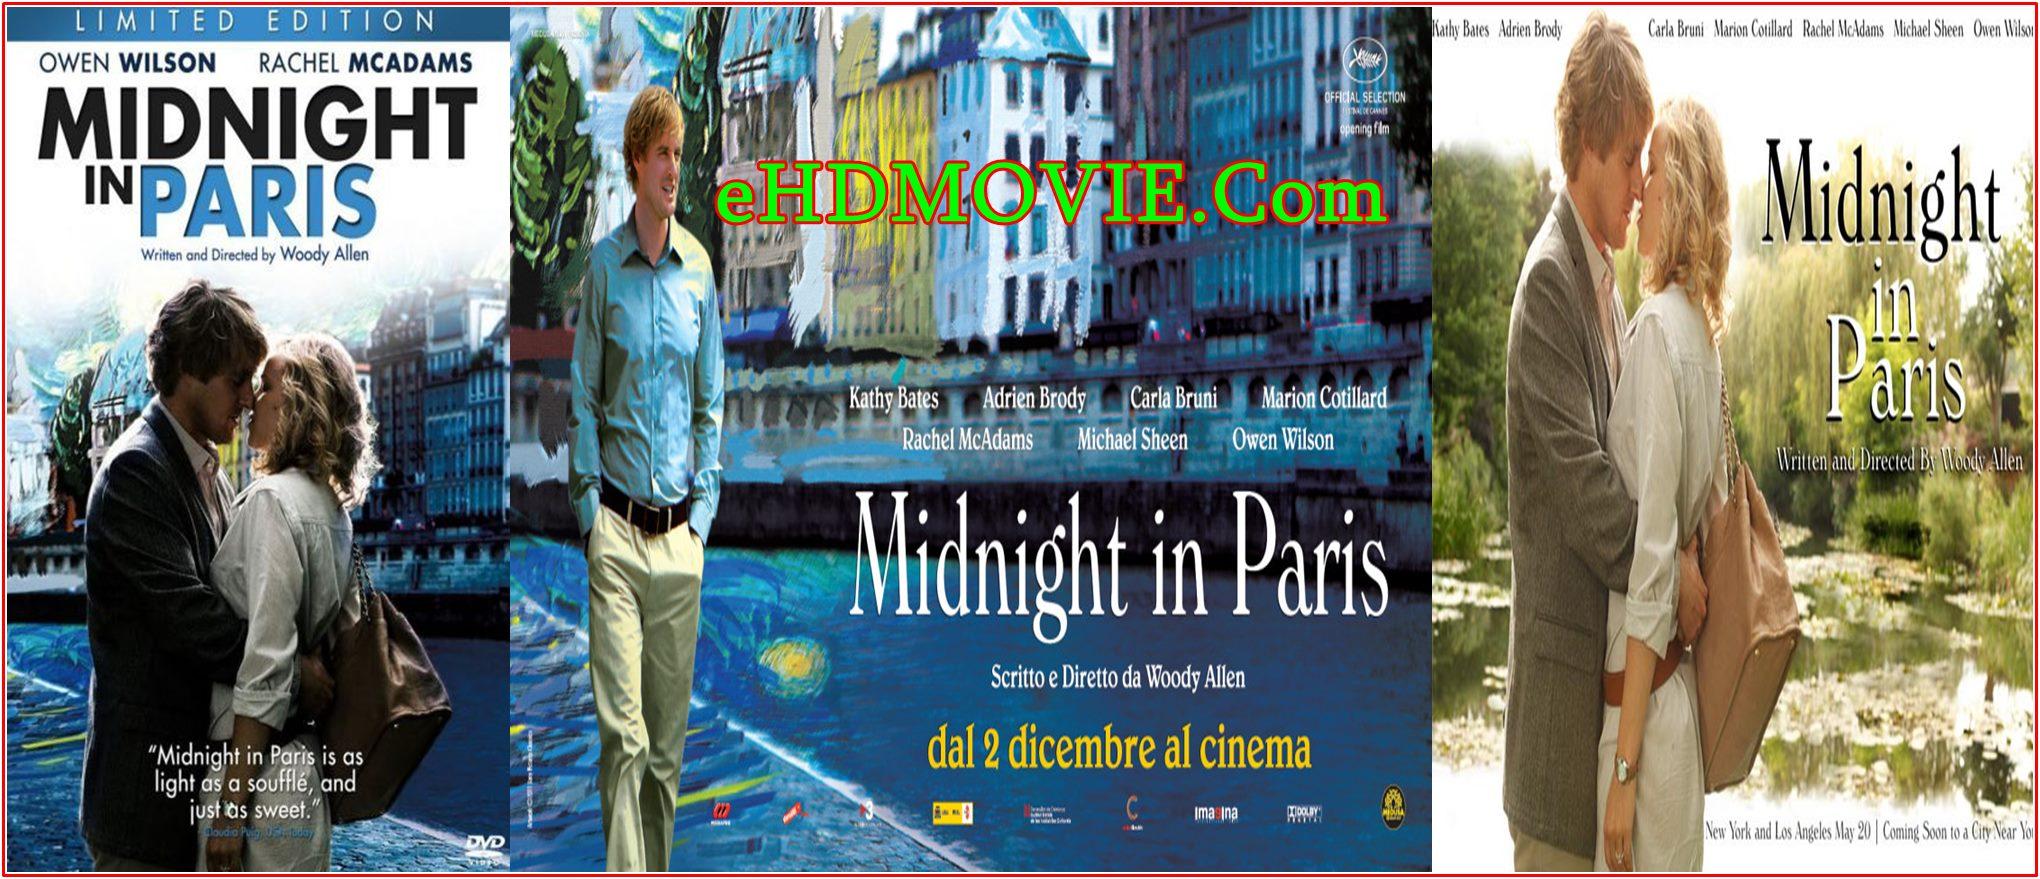 Midnight in Paris 2011 Full Movie English 720p – 480p ORG BRRip 350MB – 750MB ESubs Free Download